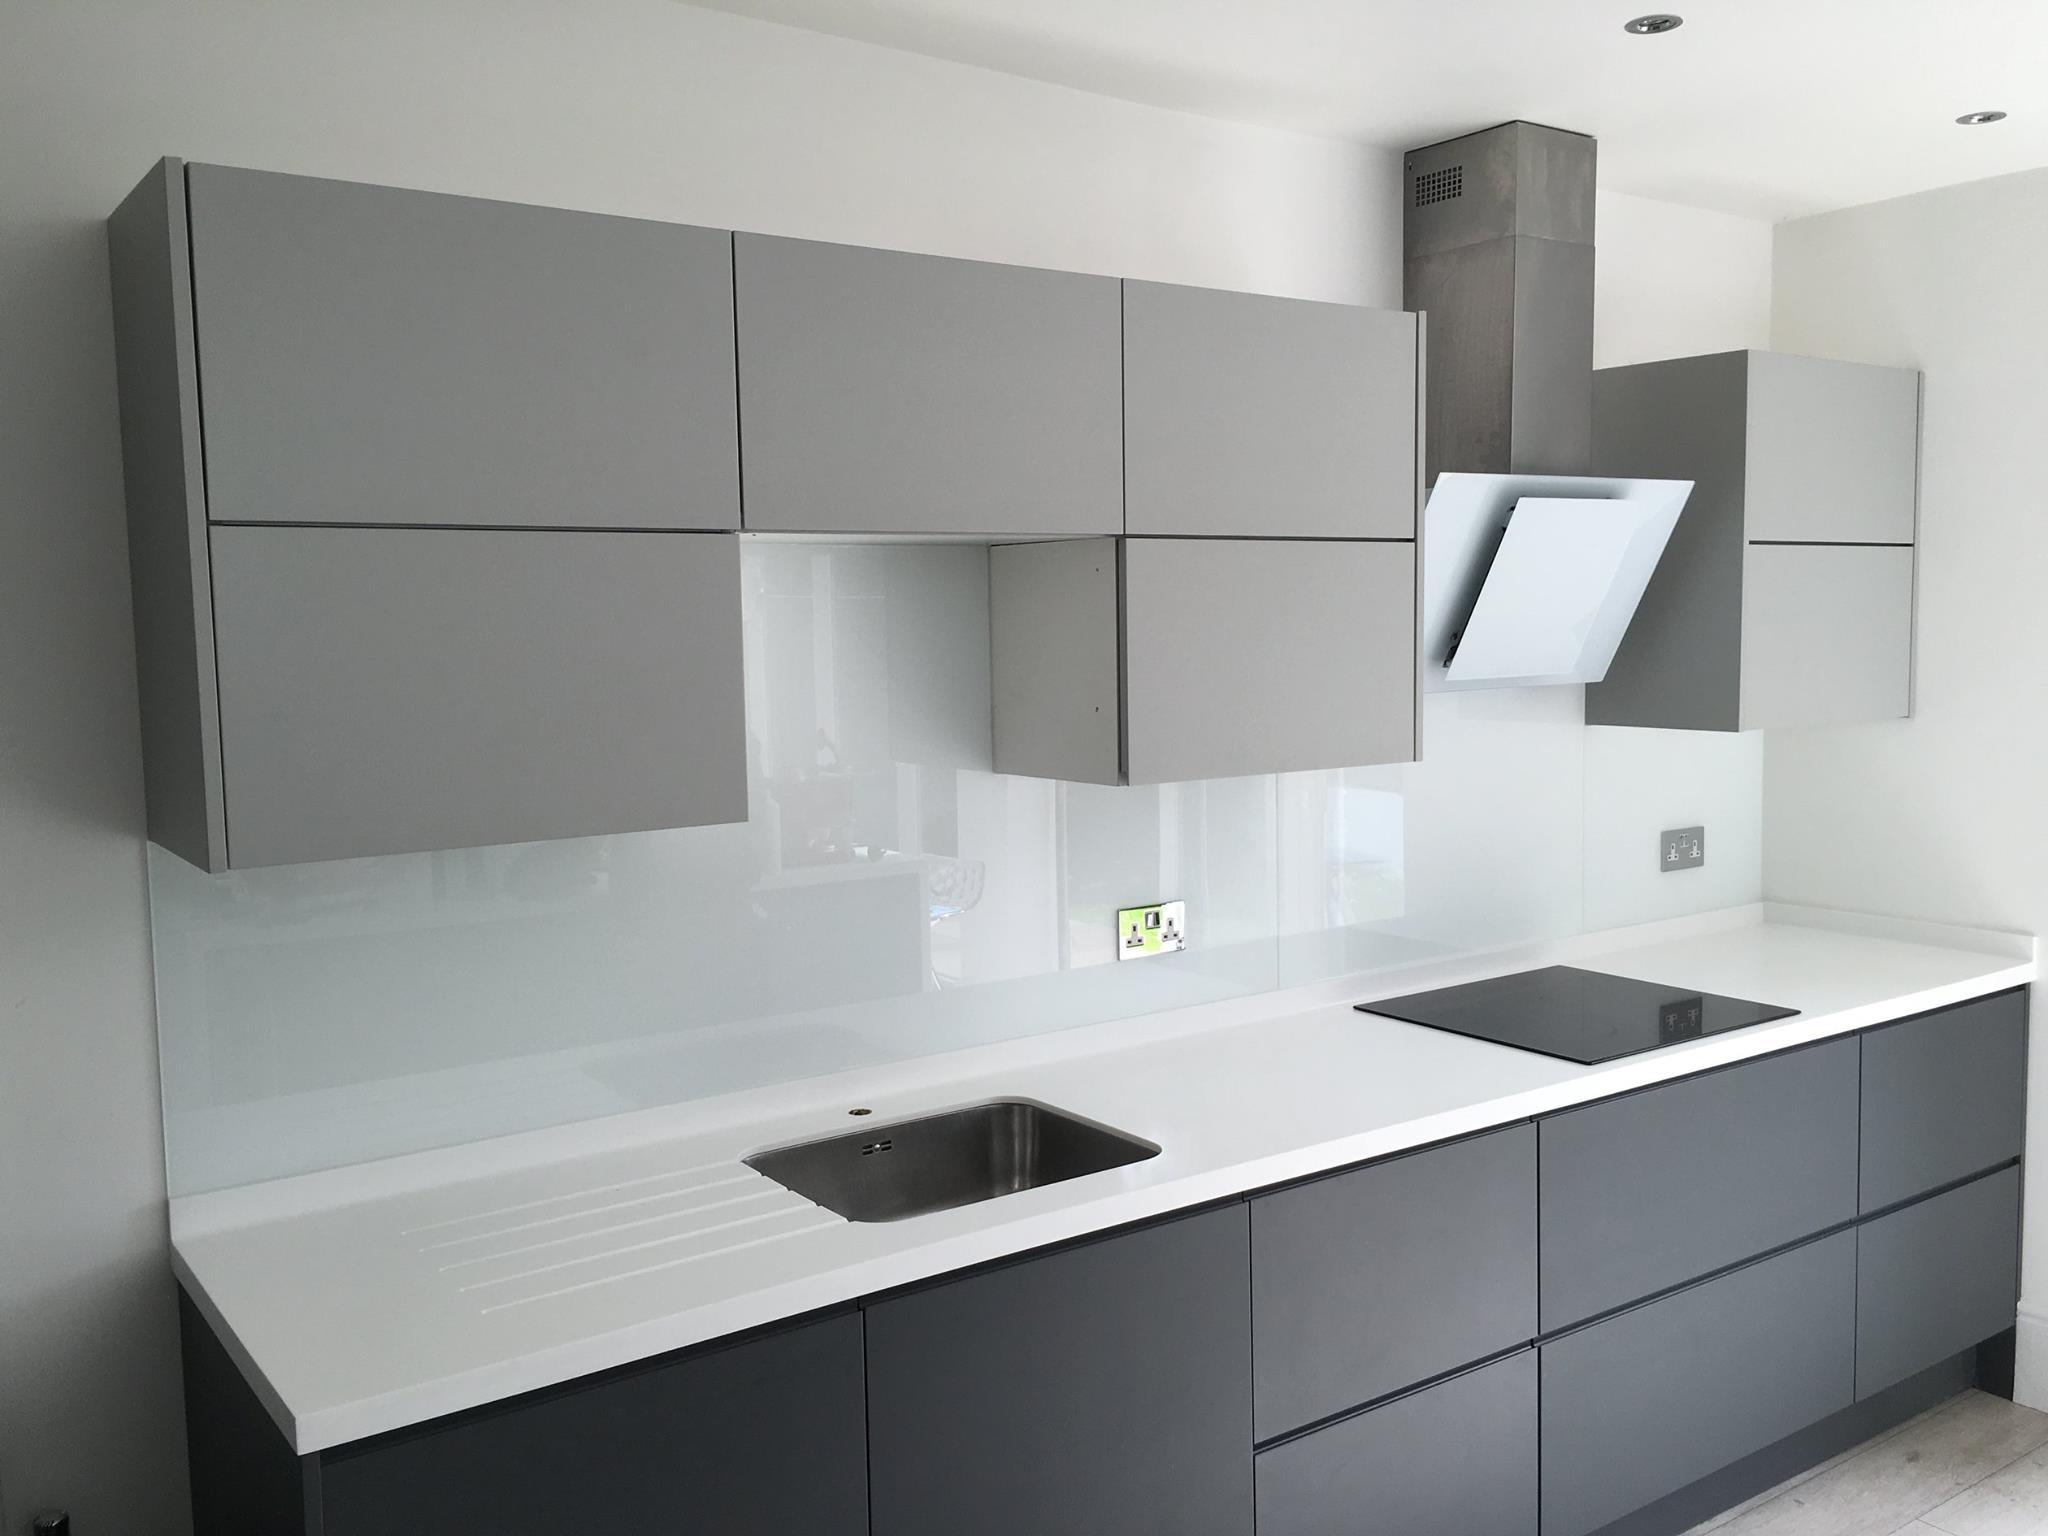 kitchen splashbacks made beautiful with glass. Black Bedroom Furniture Sets. Home Design Ideas